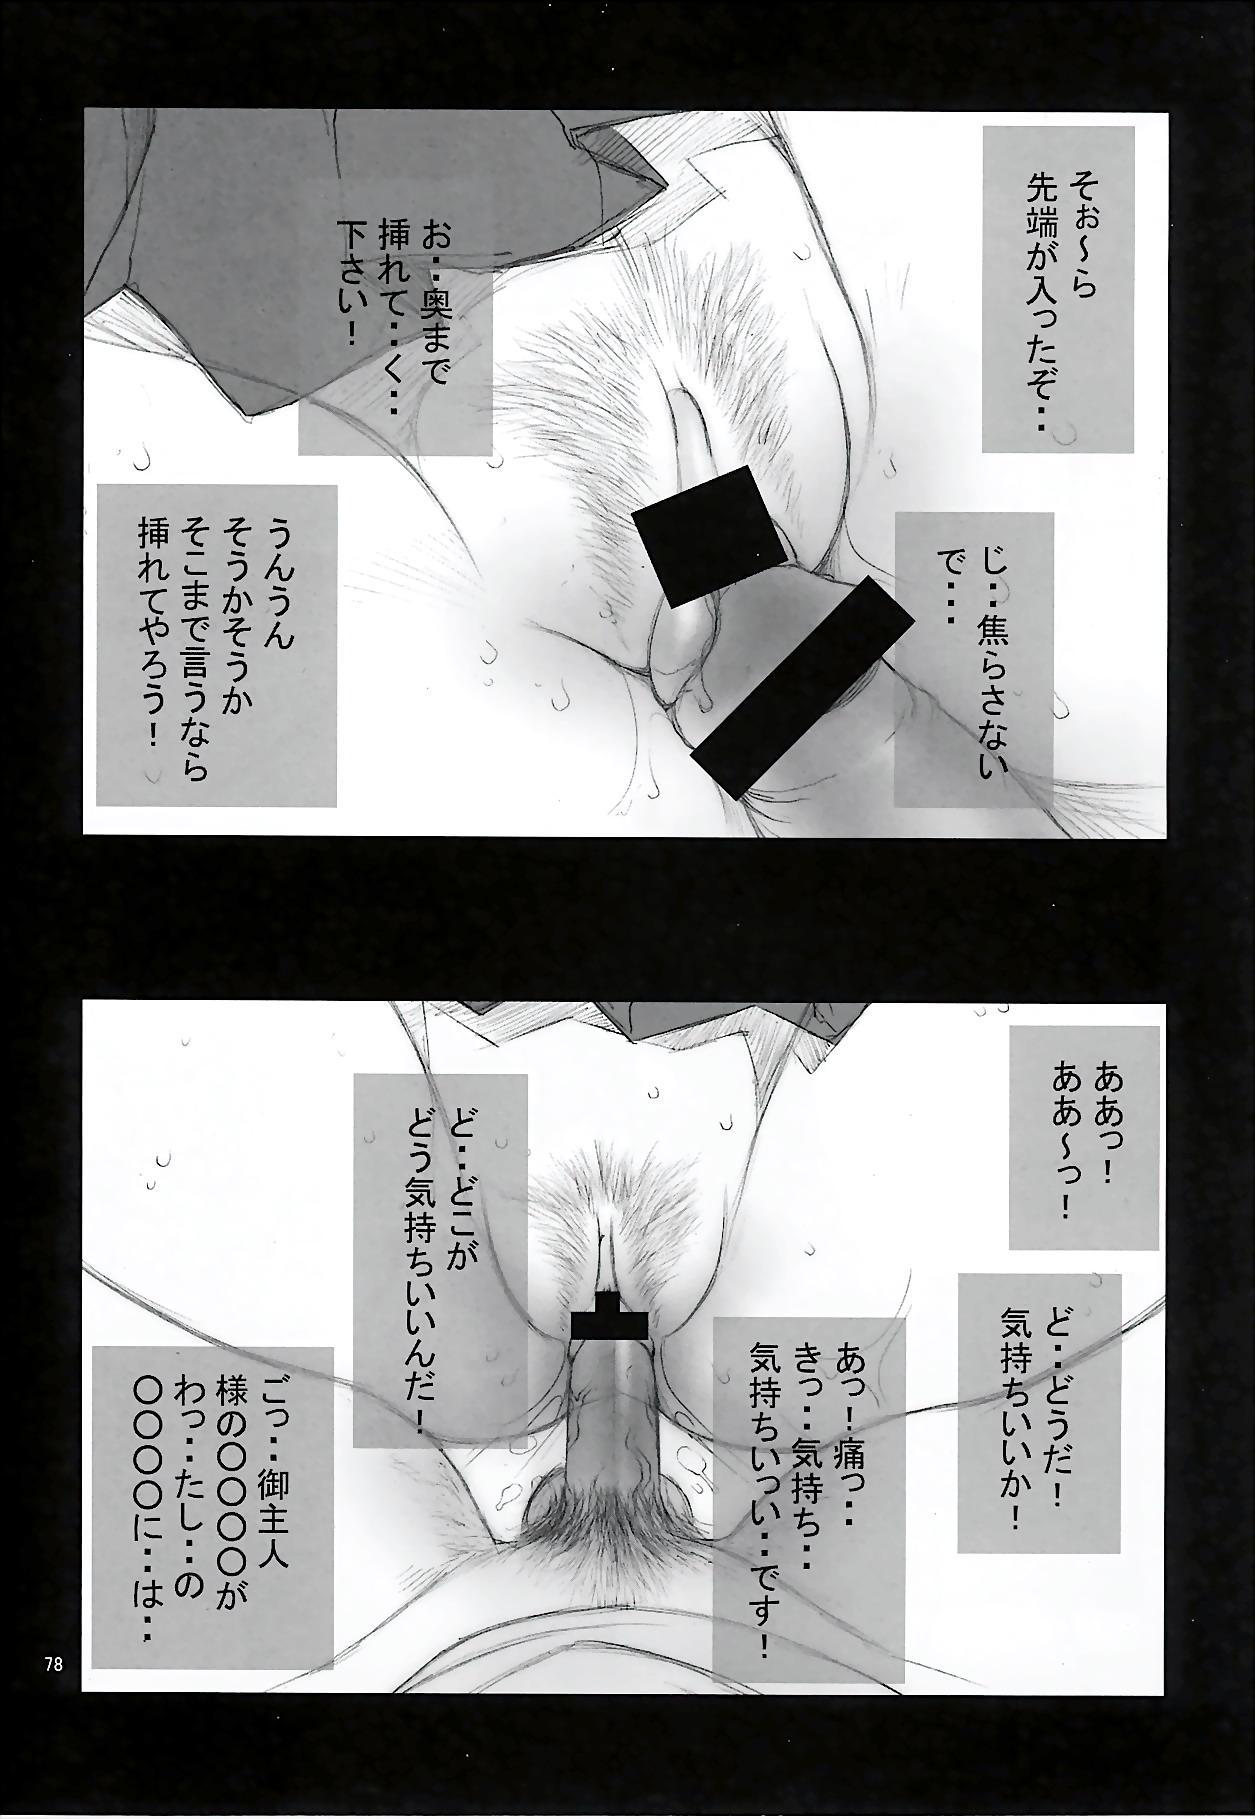 NORI-HARU COMPLETE 1 78